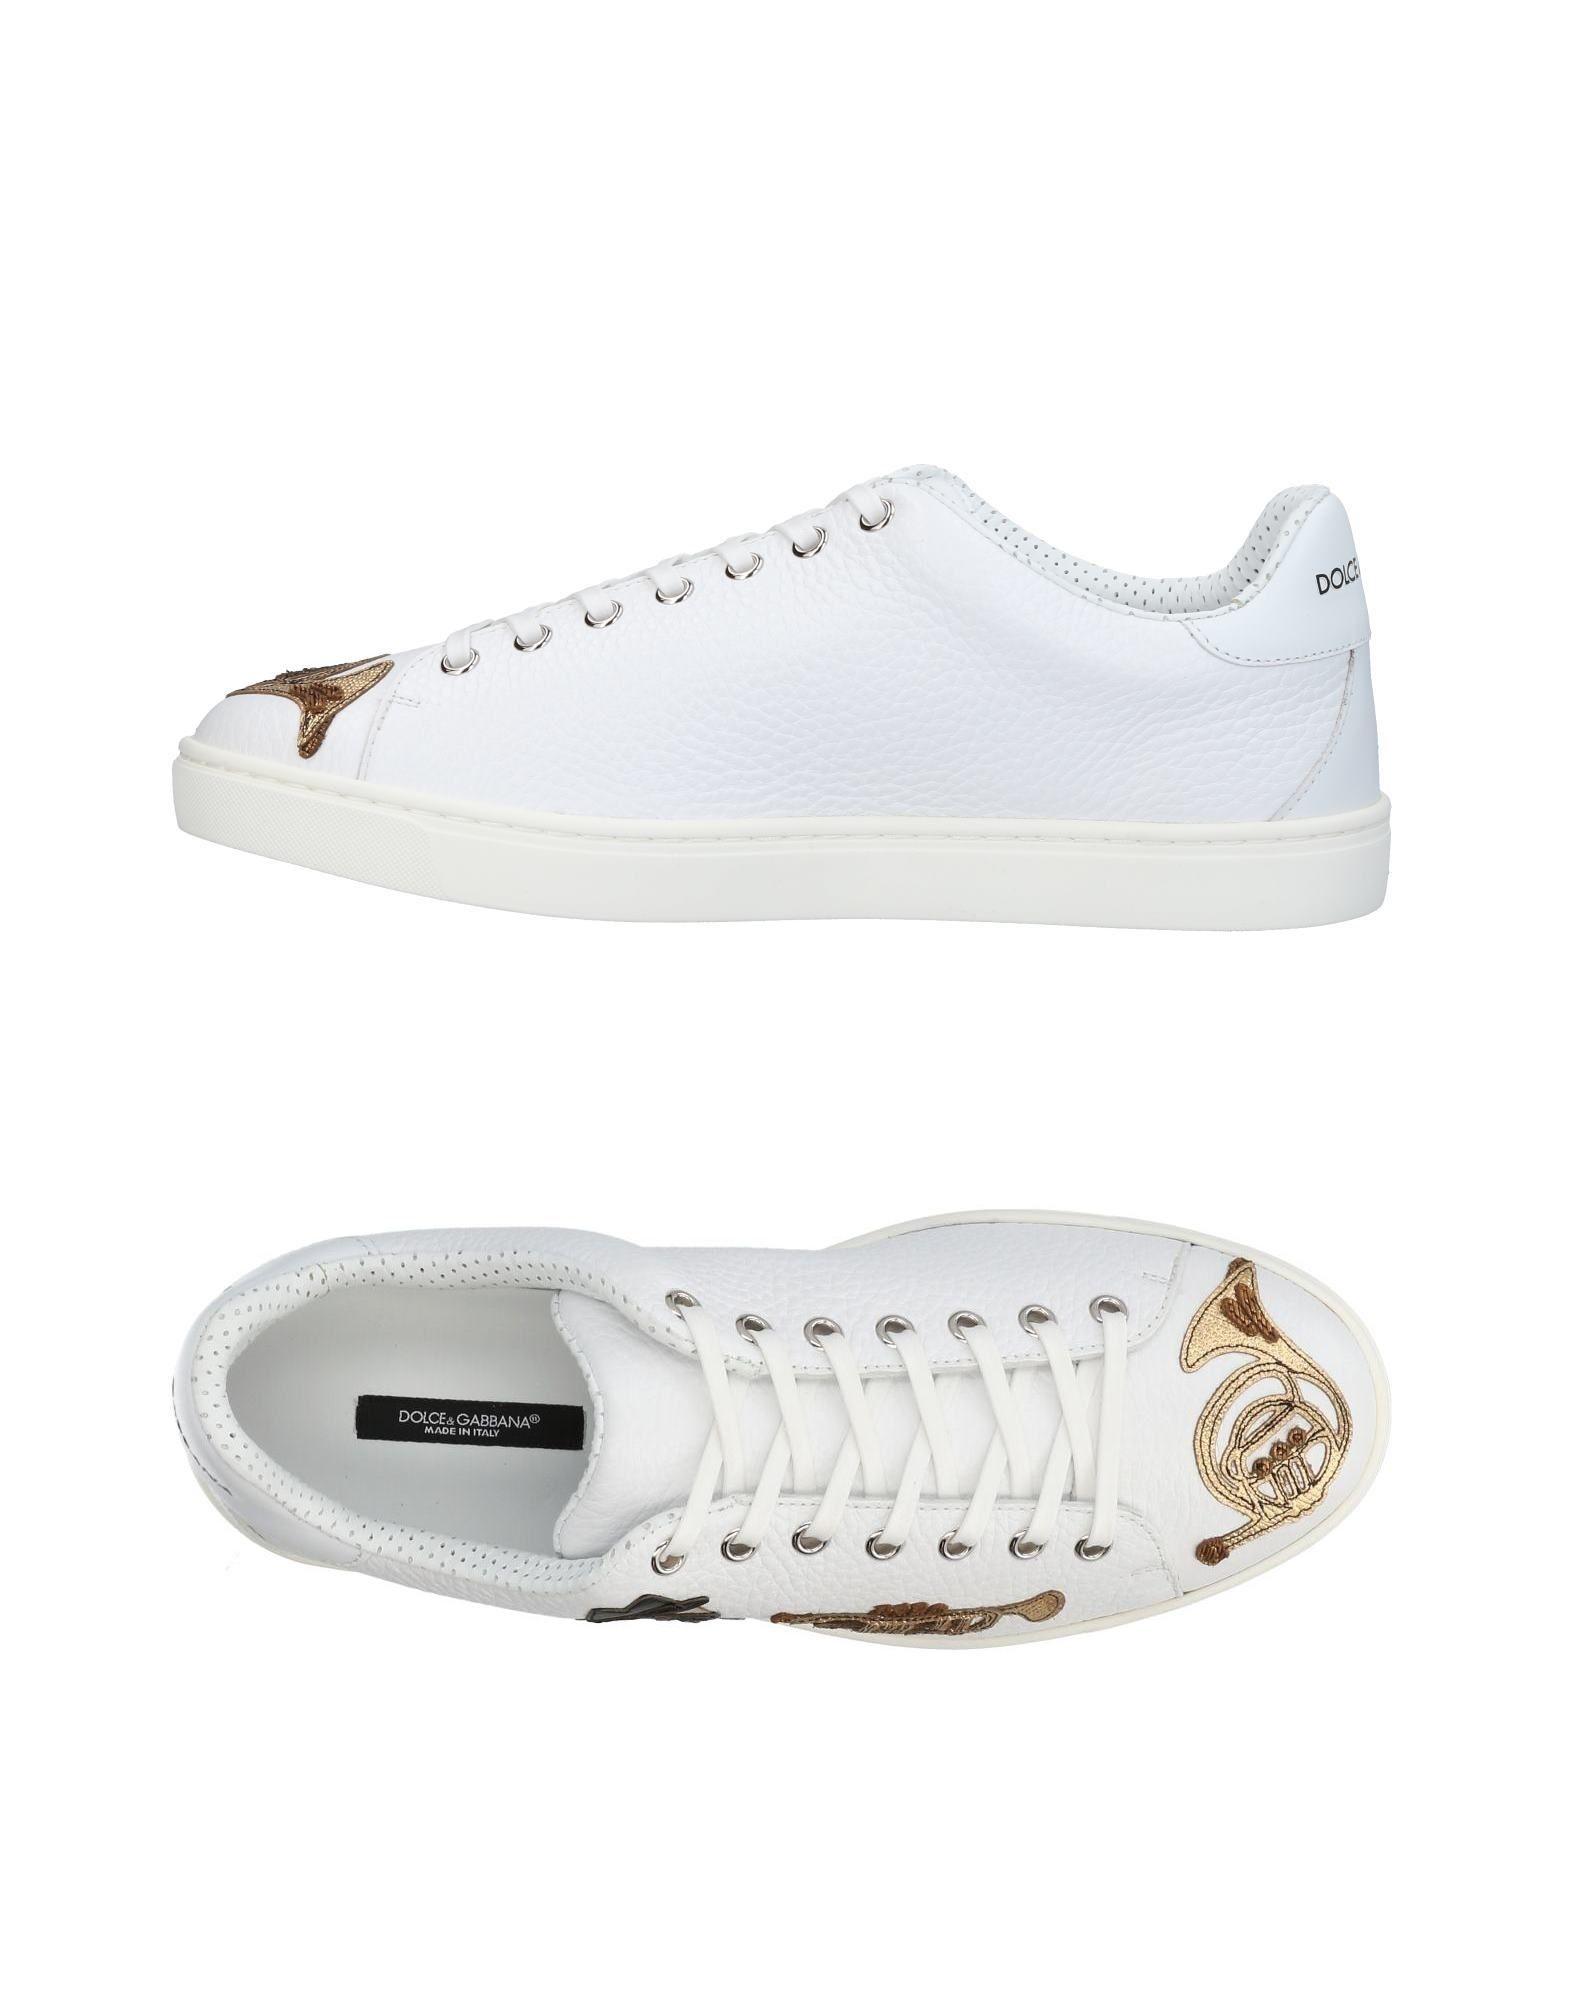 Dolce & Gabbana Sneakers Herren  11349627NK Gute Qualität beliebte Schuhe